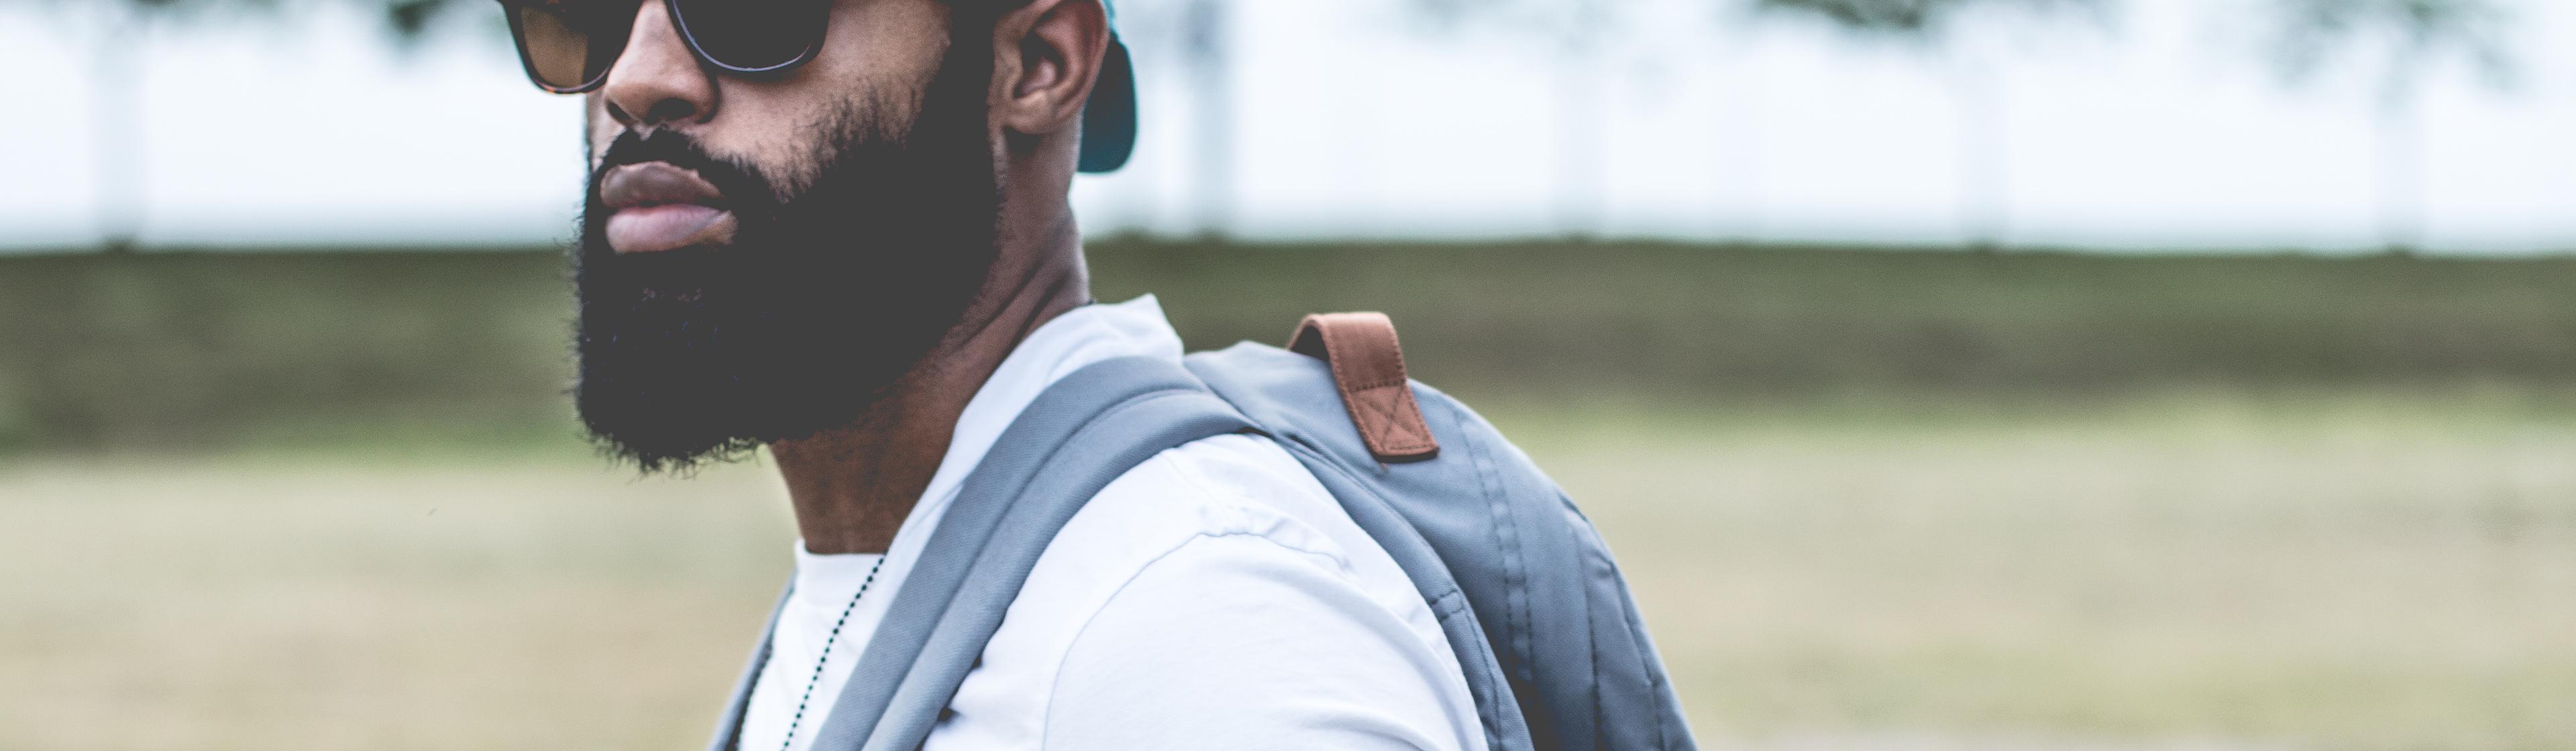 Style Guide: University Wardrobe Essentials